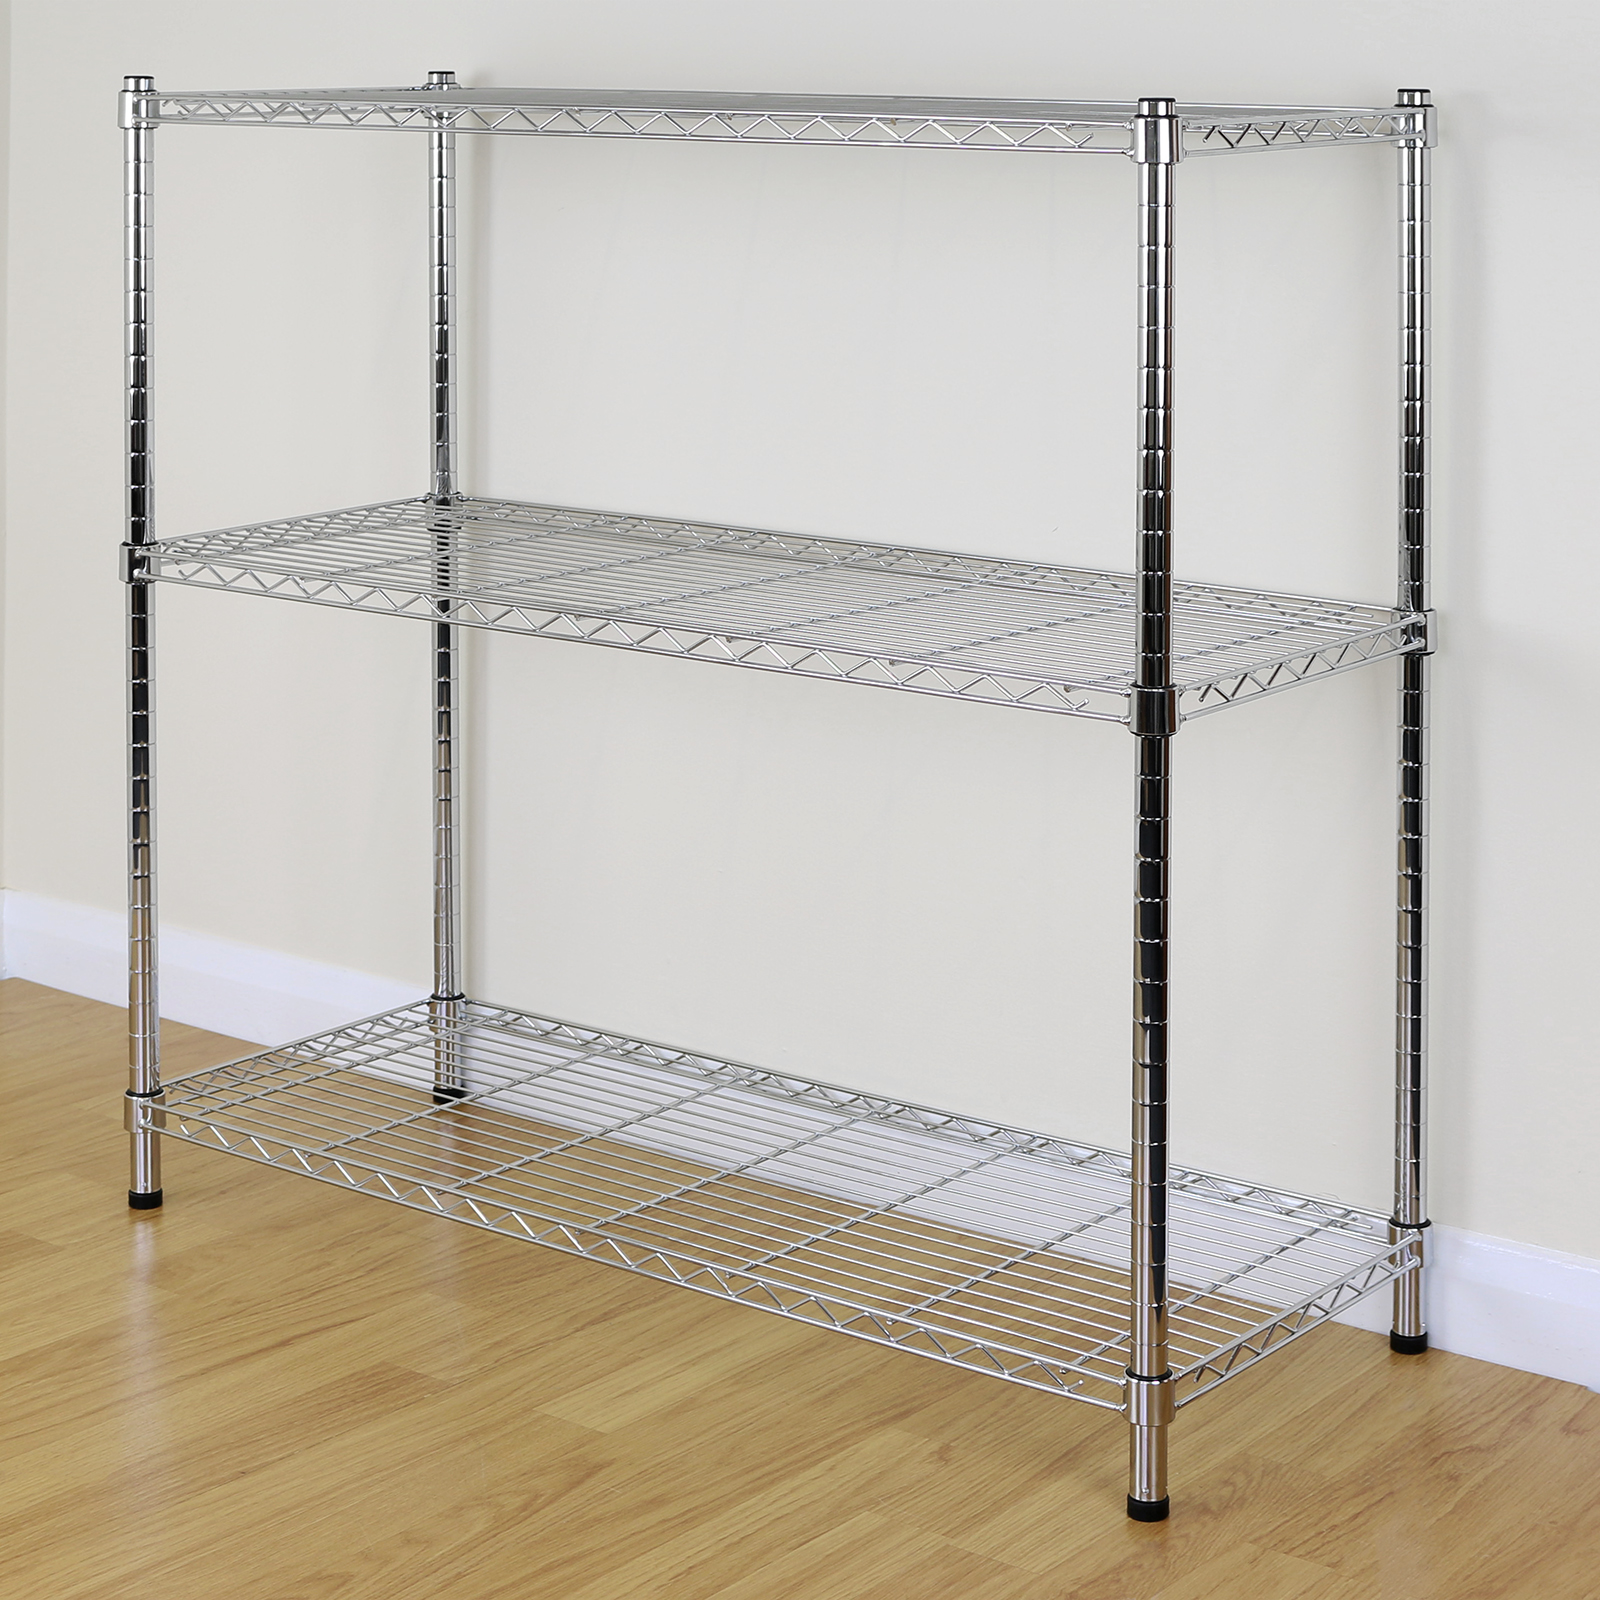 3 Tier Chrome Metal Storage Rack Shelving Wire Shelf